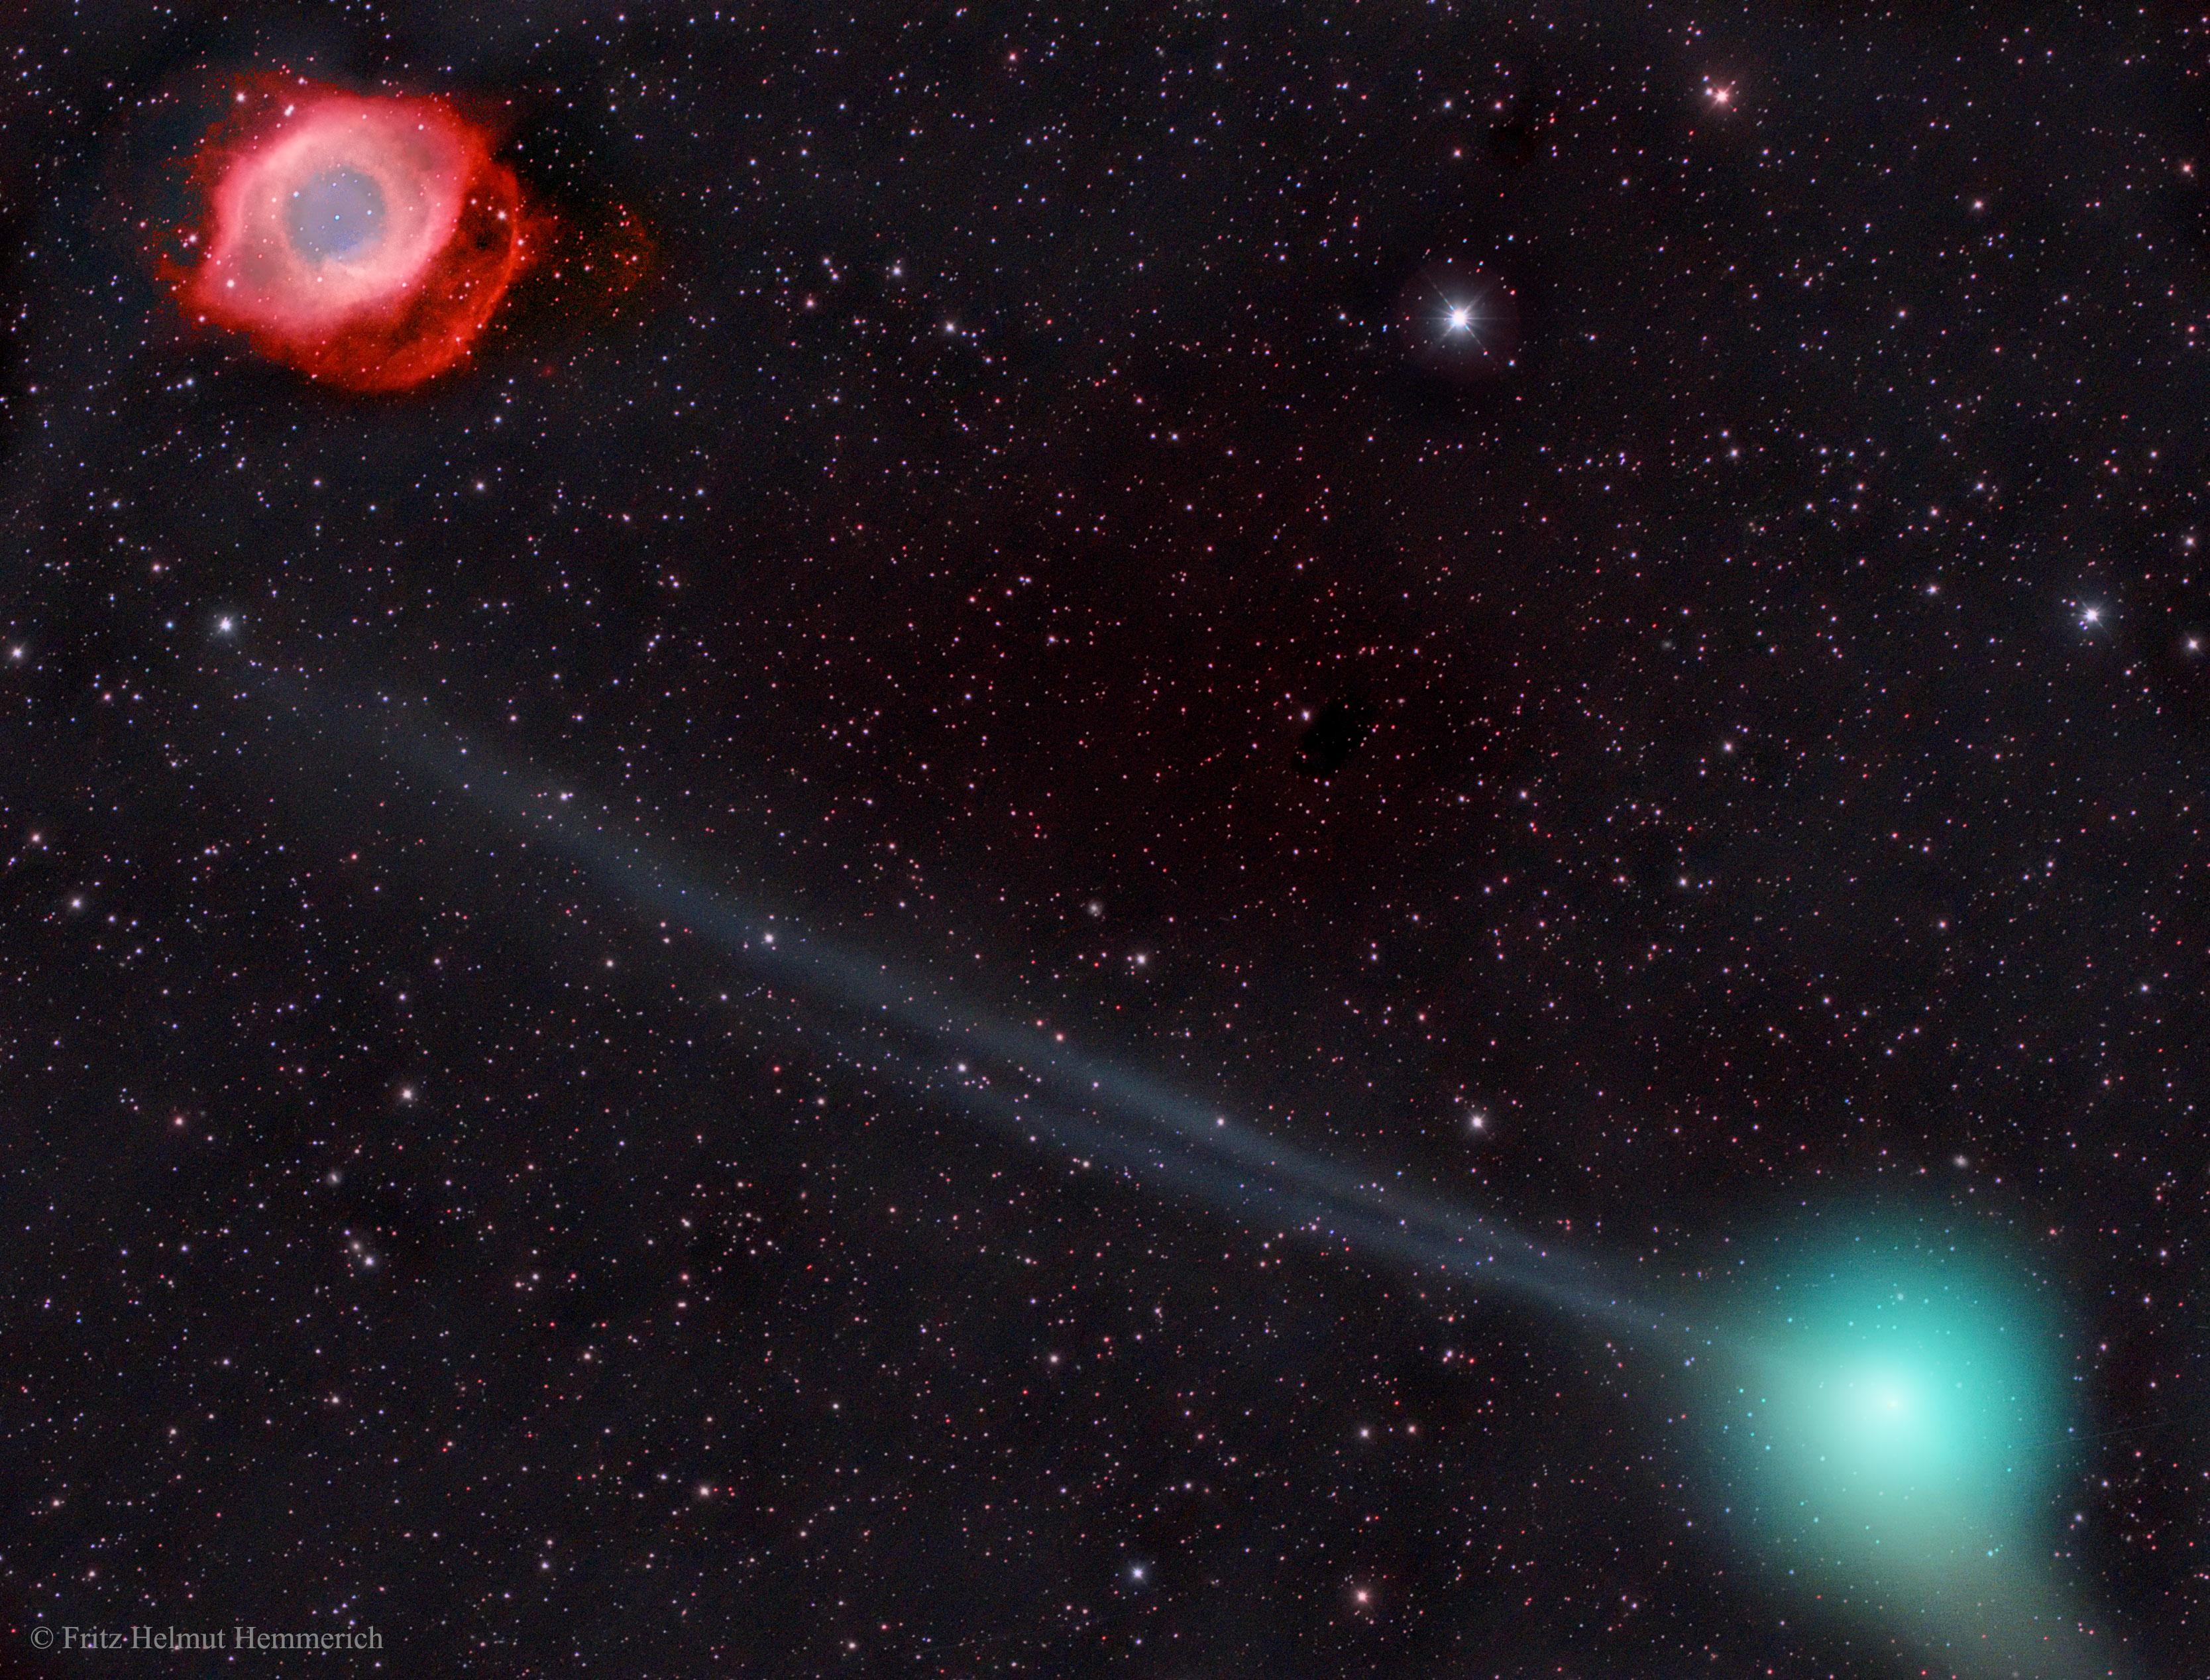 2016 June 5 - Comet PanSTARRS and the Helix Nebula